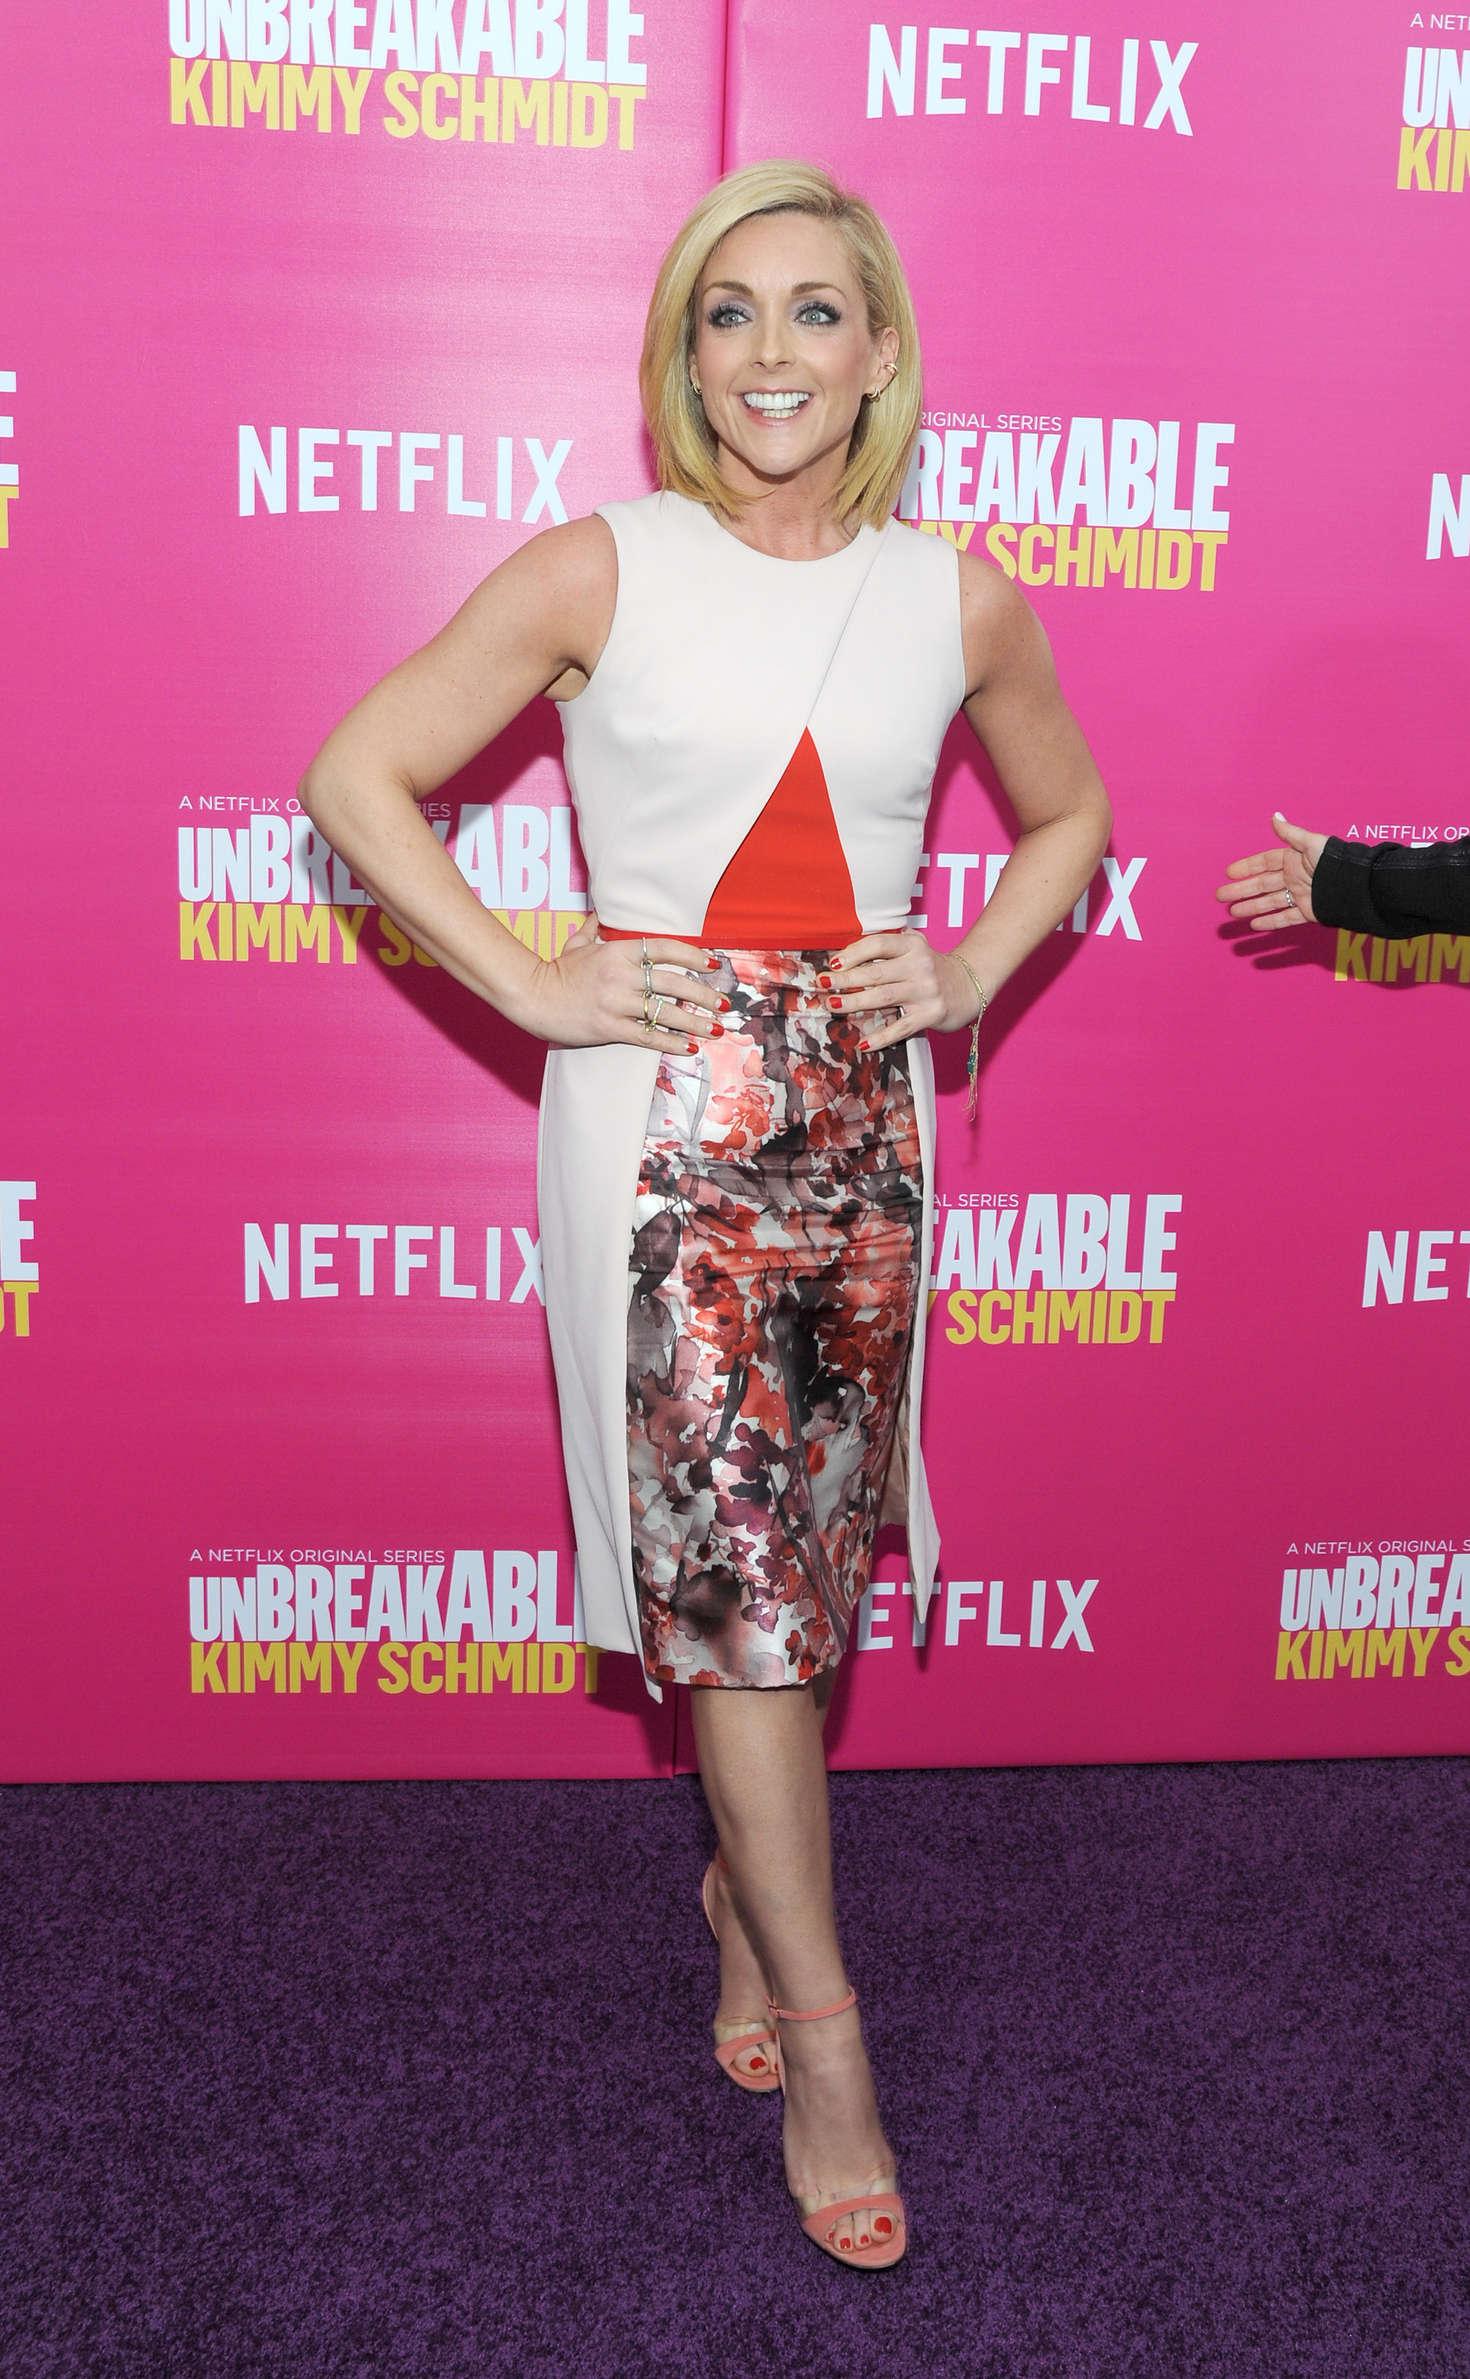 Jane Krakowski Unbreakable Kimmy Schmidt Season Premiere in New York